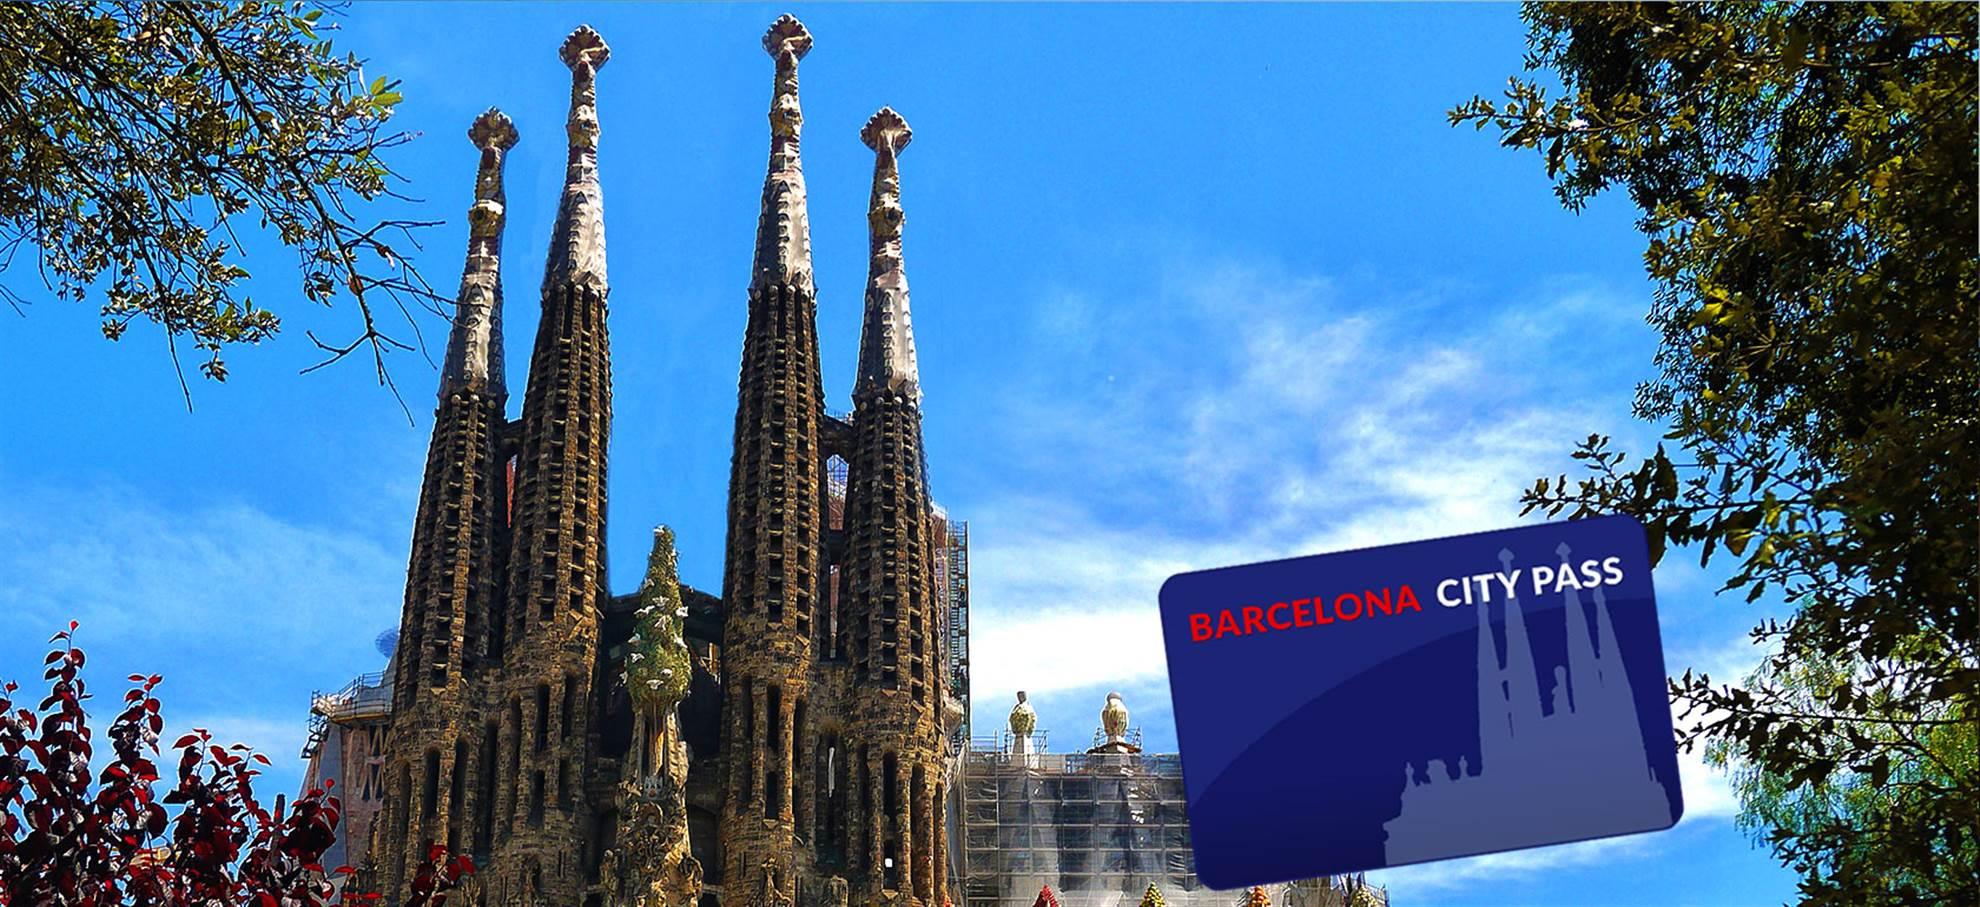 Барселона City Pass (Саграда Фамилия с Аудиогидом, Парк Гуэль)